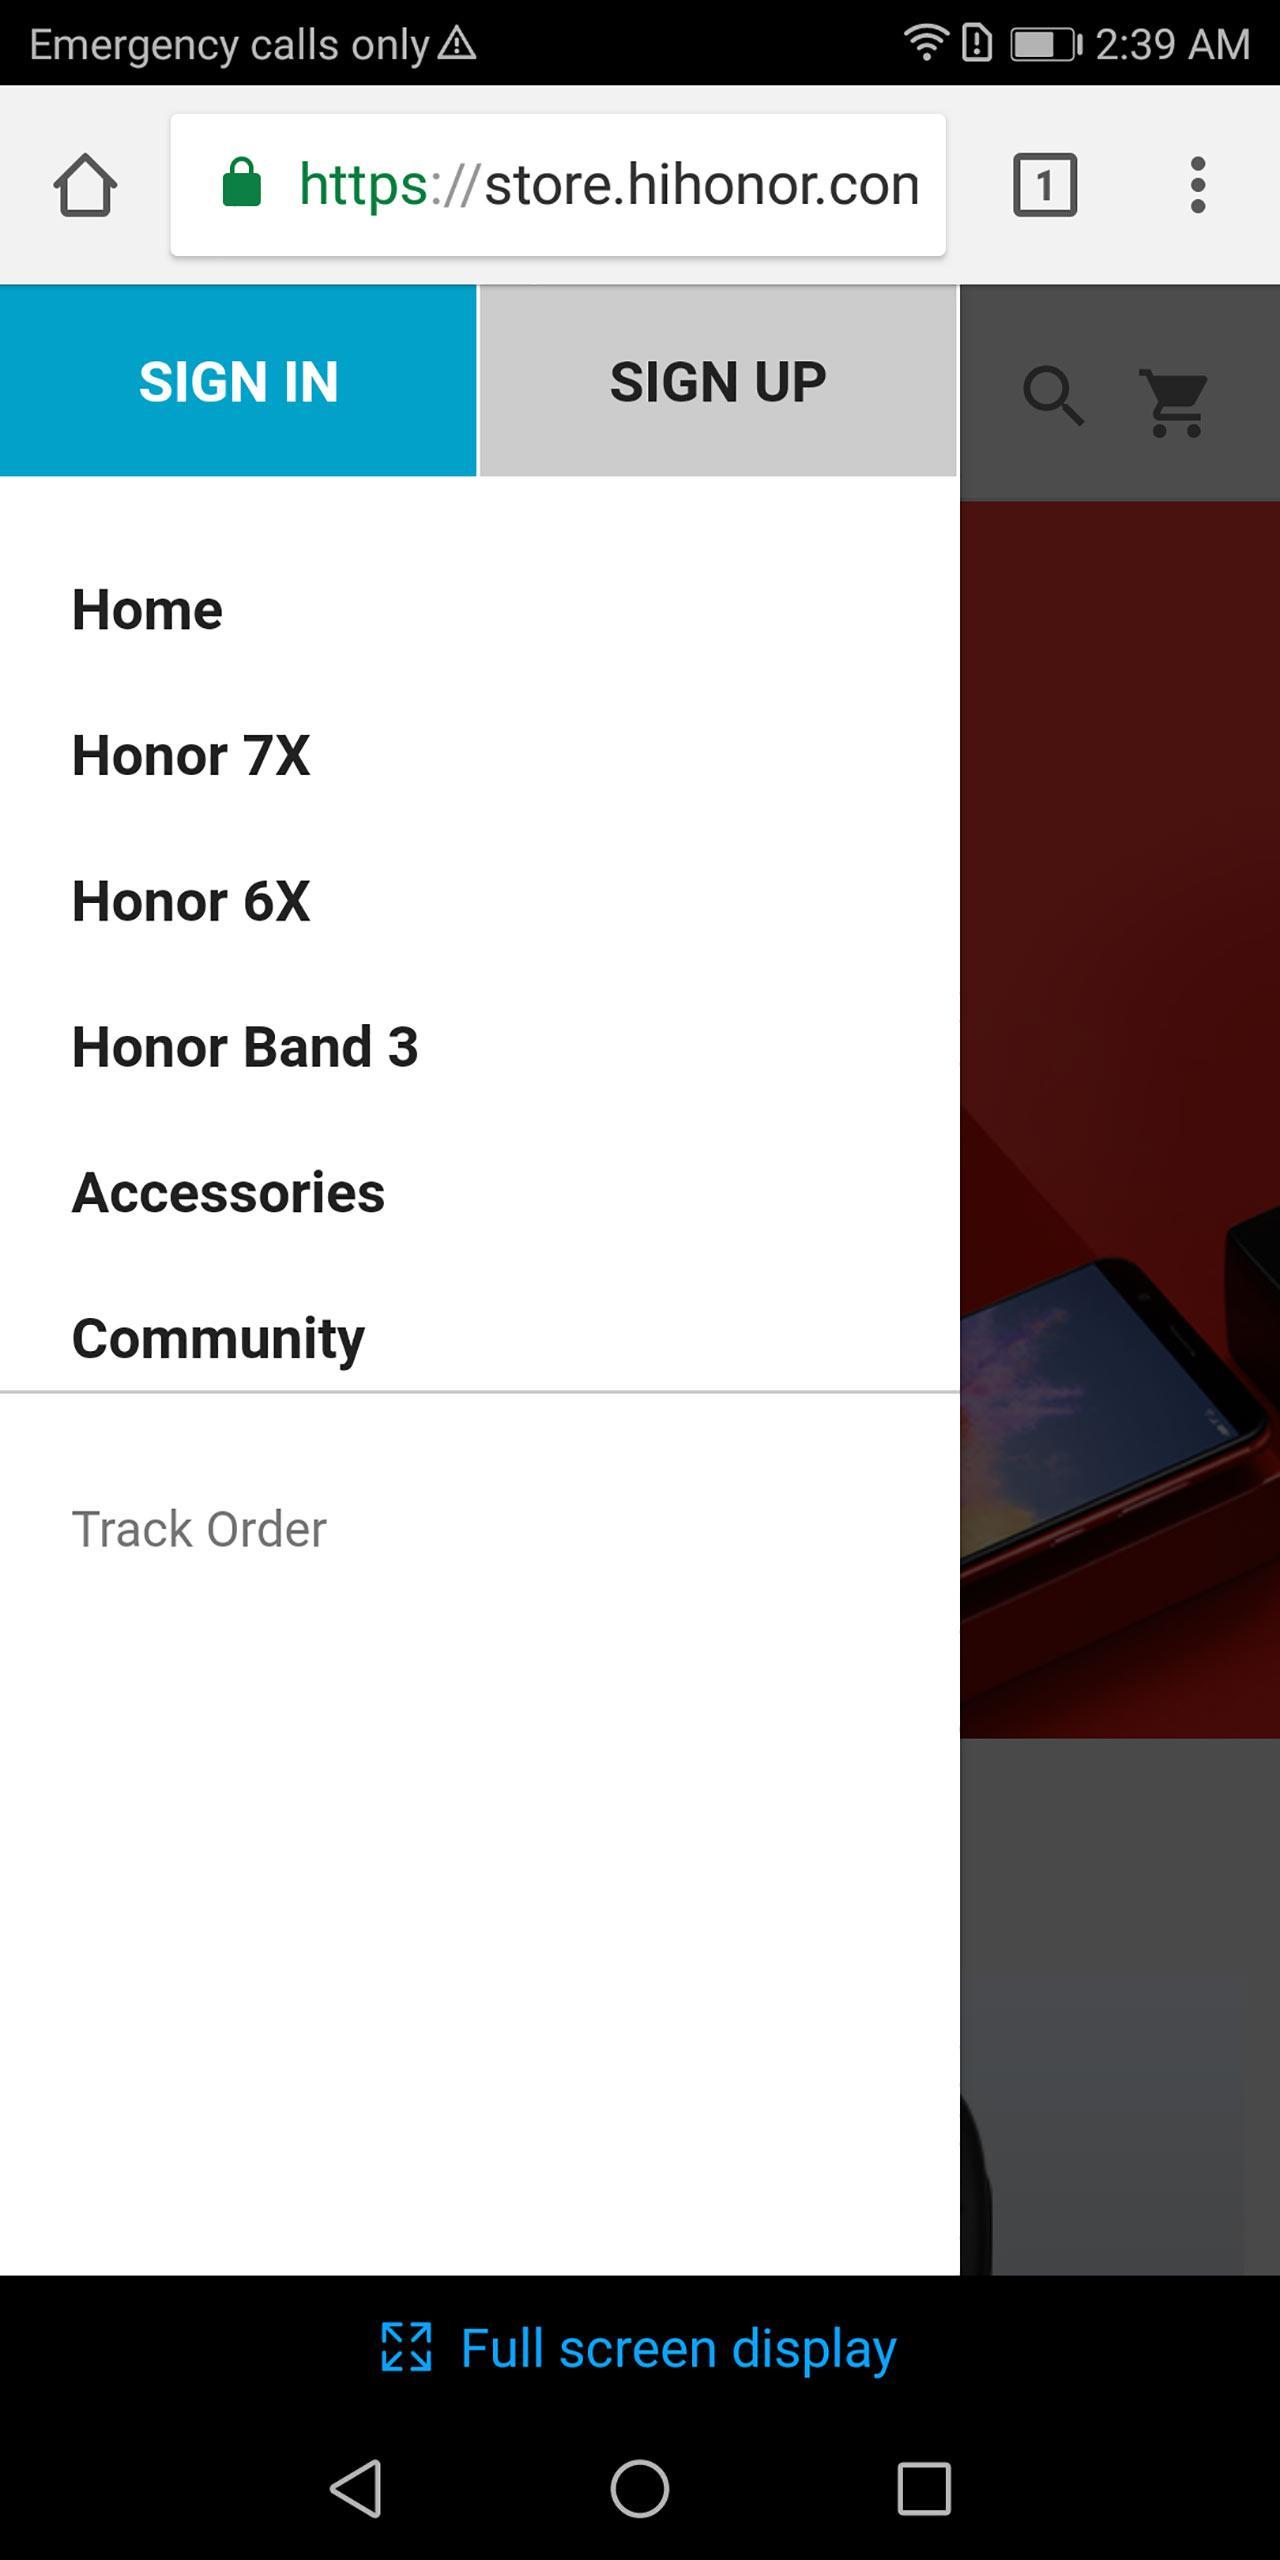 Honor 7x Review: This $200 phone surprised me - SlashGear